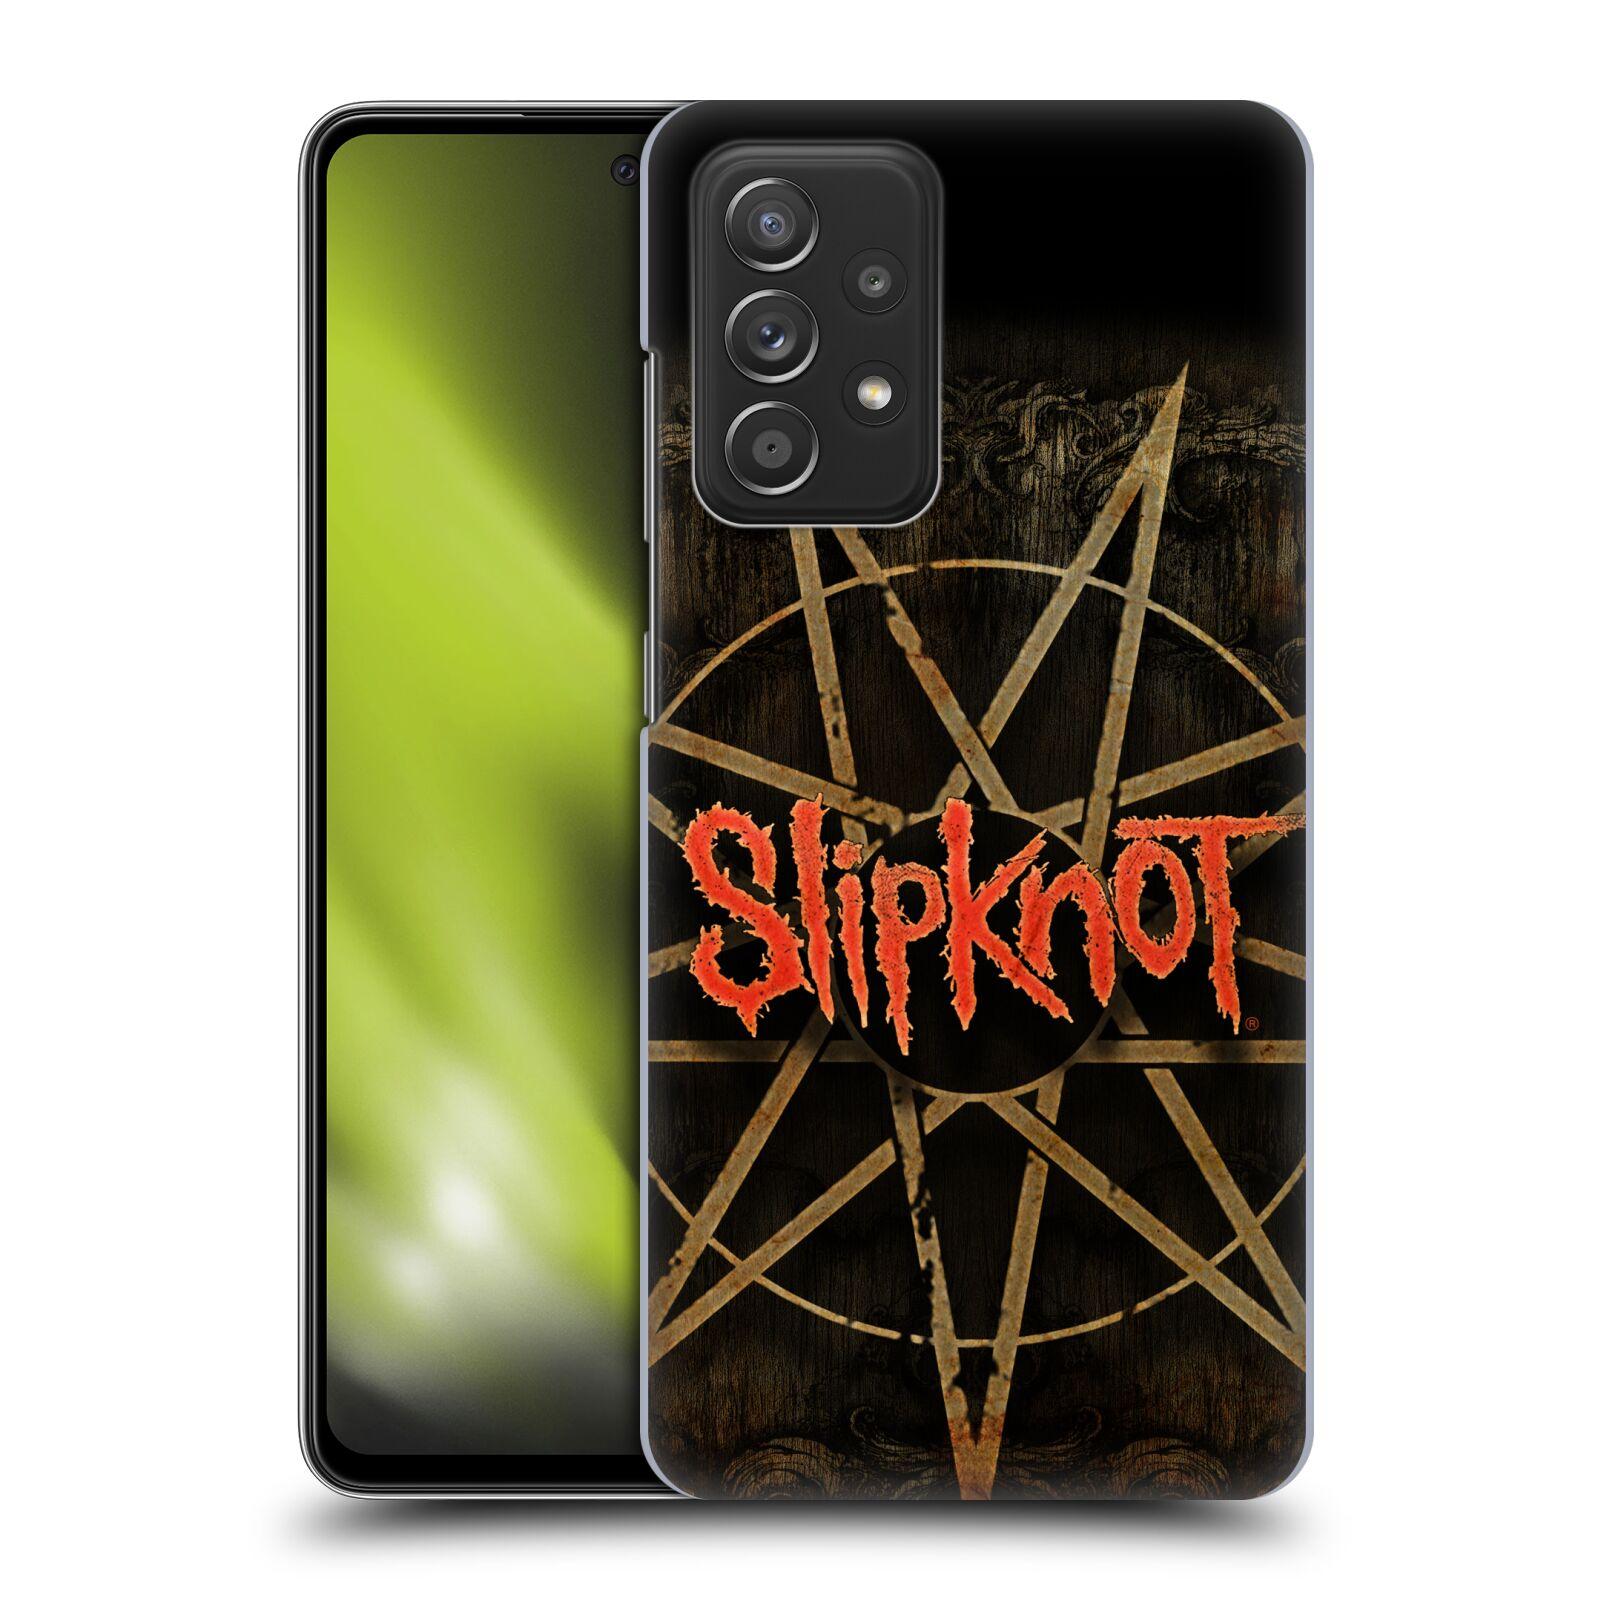 Plastové pouzdro na mobil Samsung Galaxy A52 / A52 5G / A52s 5G - Head Case - Slipknot - Znak